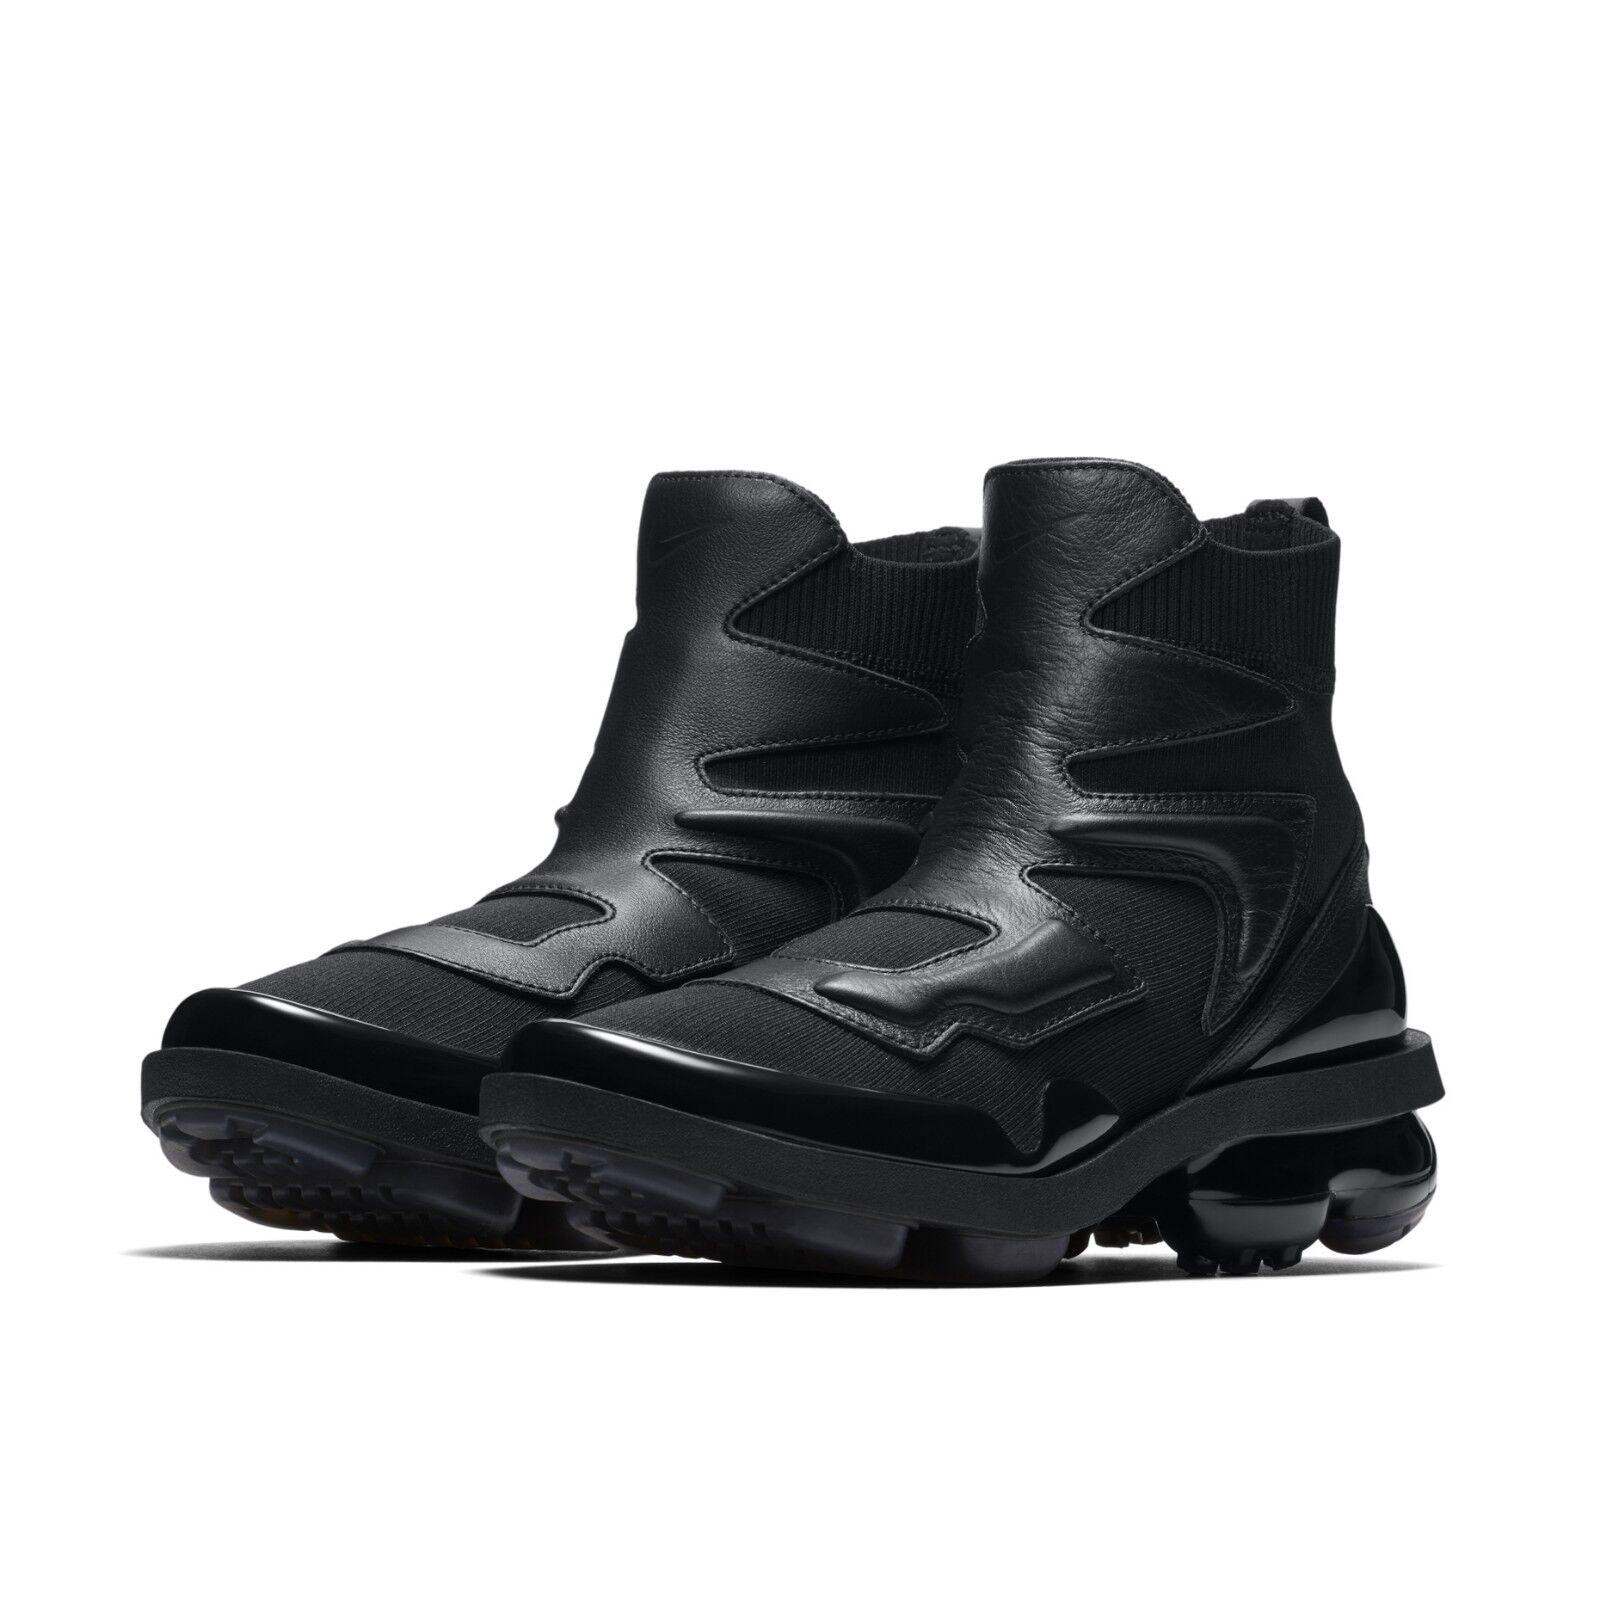 Nike Womens Wmns Wmns Wmns Vapormax Light II 2 Hi Triple Black Fashion shoes AO4537-001 f18279